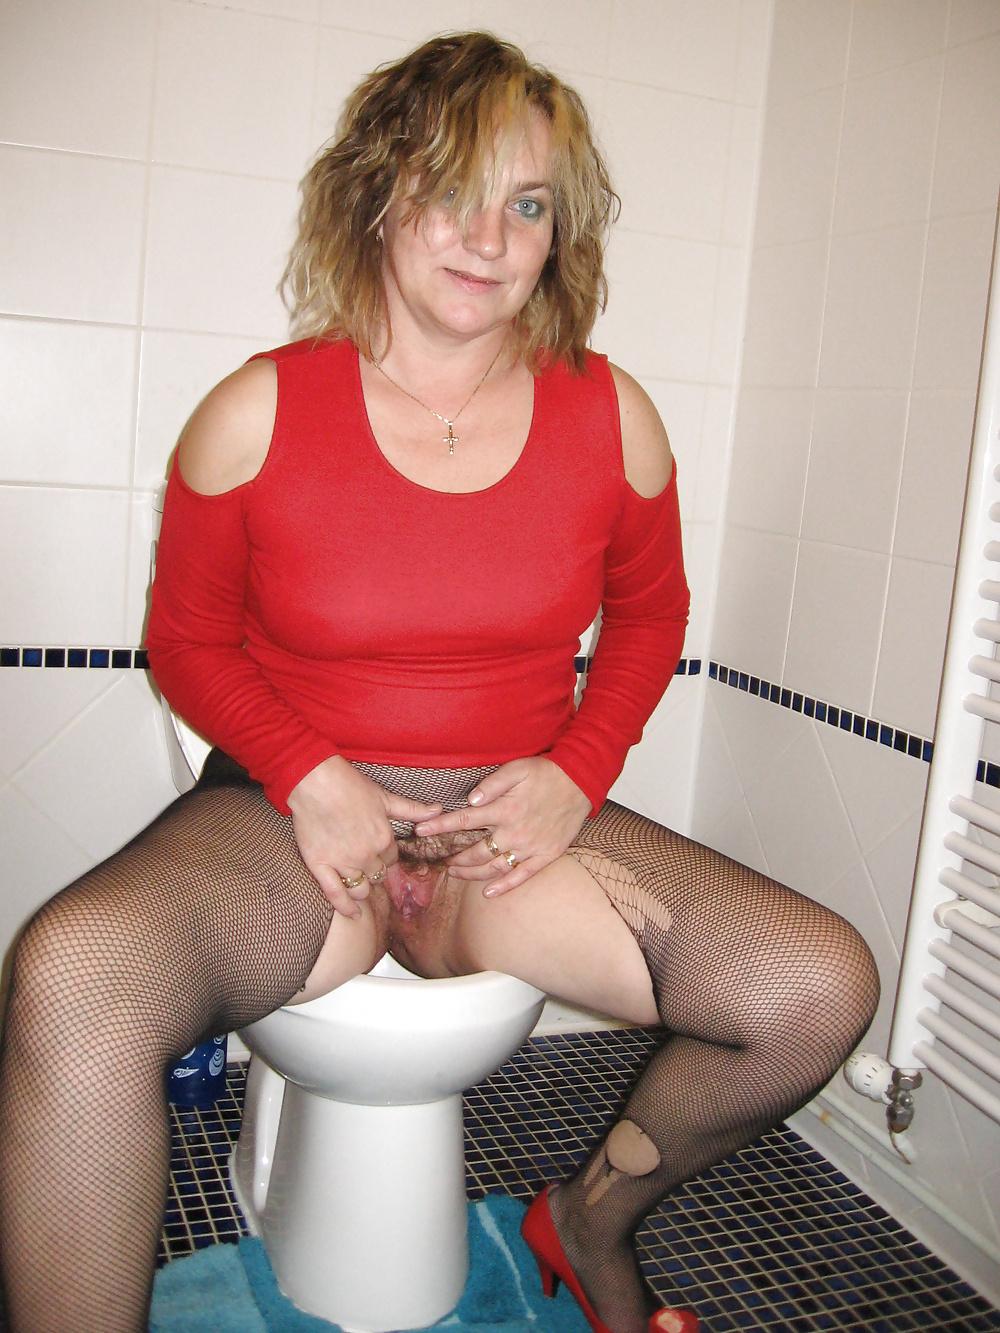 Erotic Pix Jelena jankovic upskirt photos